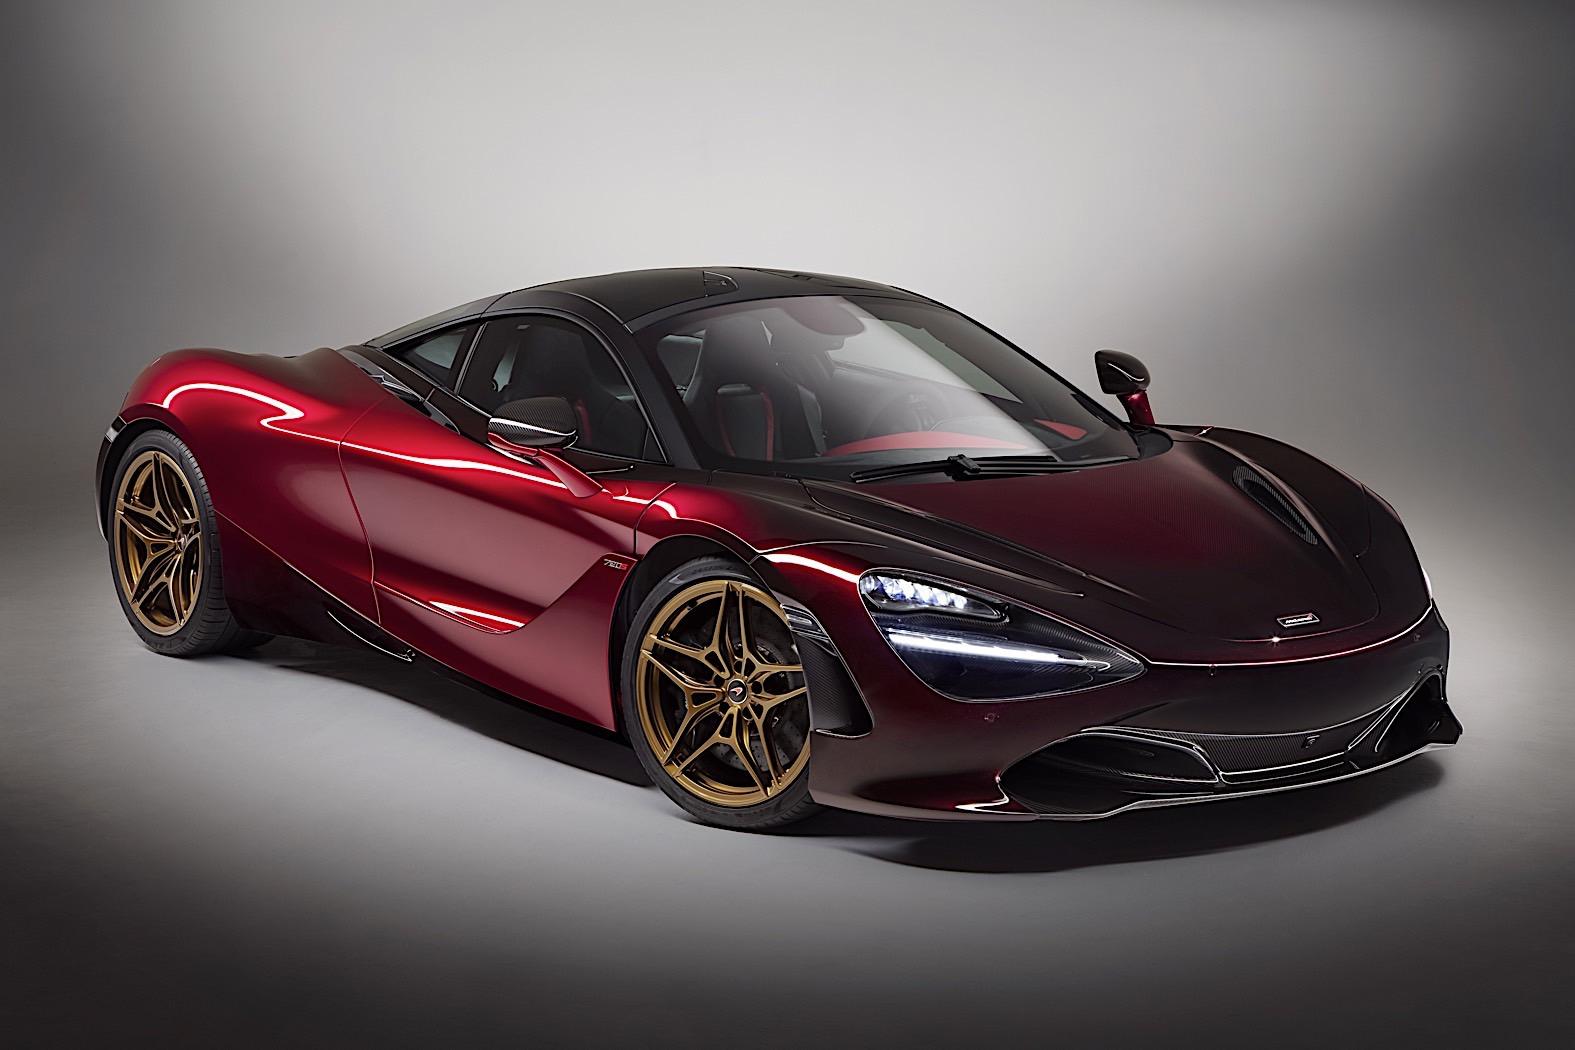 mclaren 570gt black collection meets 720s velocity for salon prive